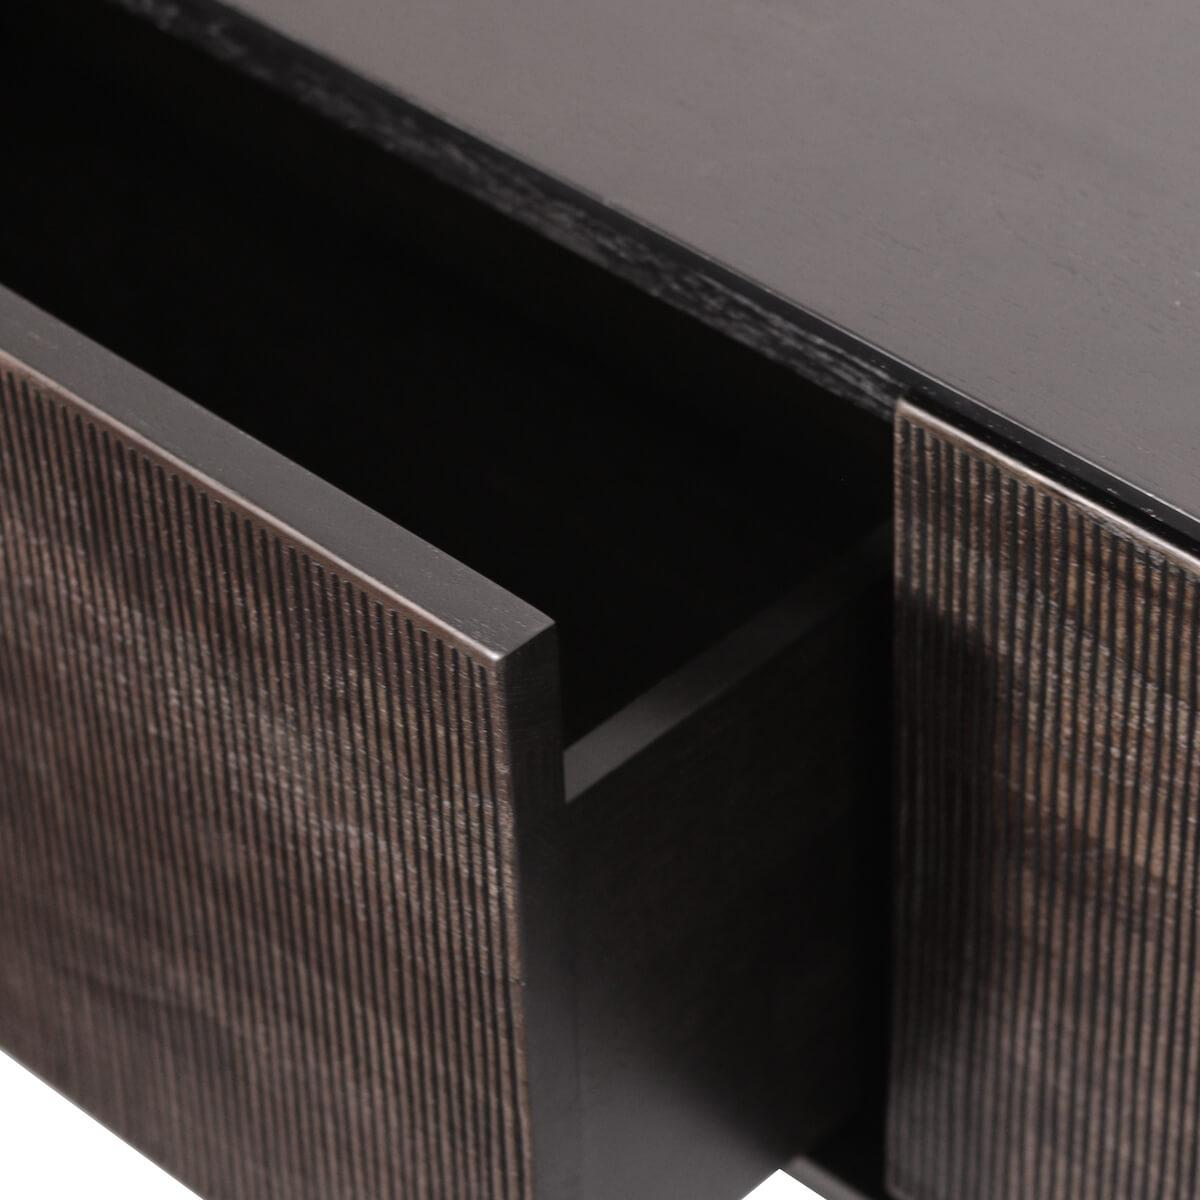 Meuble TV 162cm GROOVES Ethnicraft teck noir